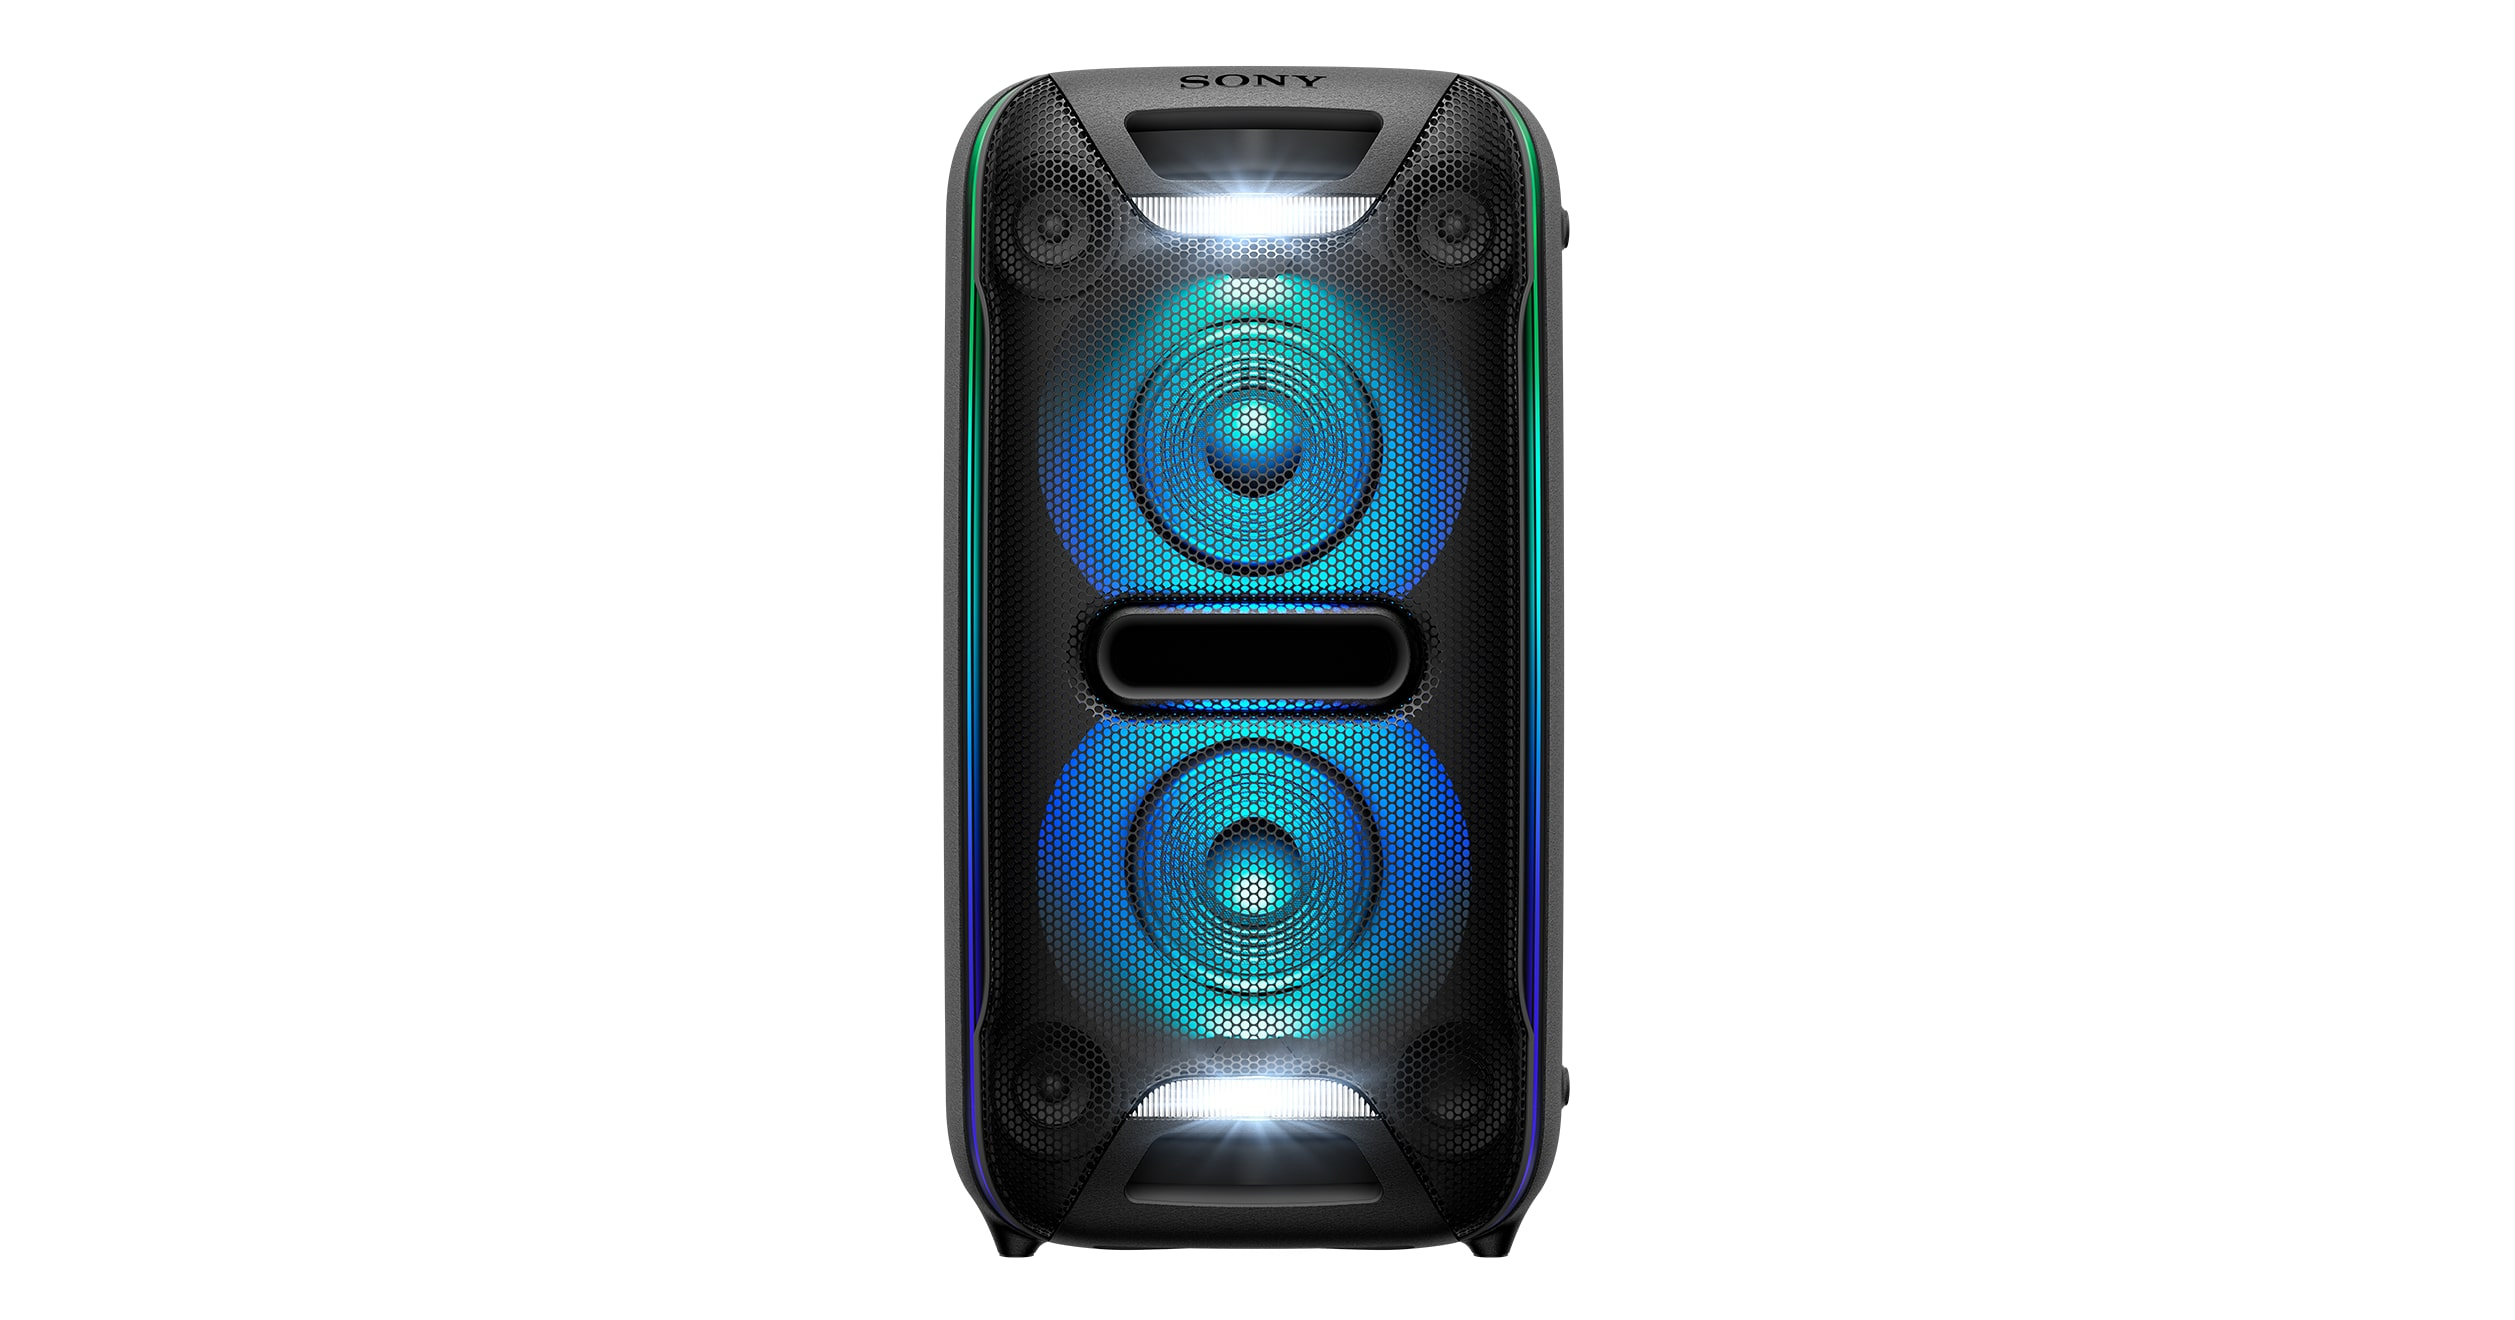 Xb72 Extra Bass High Power Audio System Gtk Xb72 Sony Us